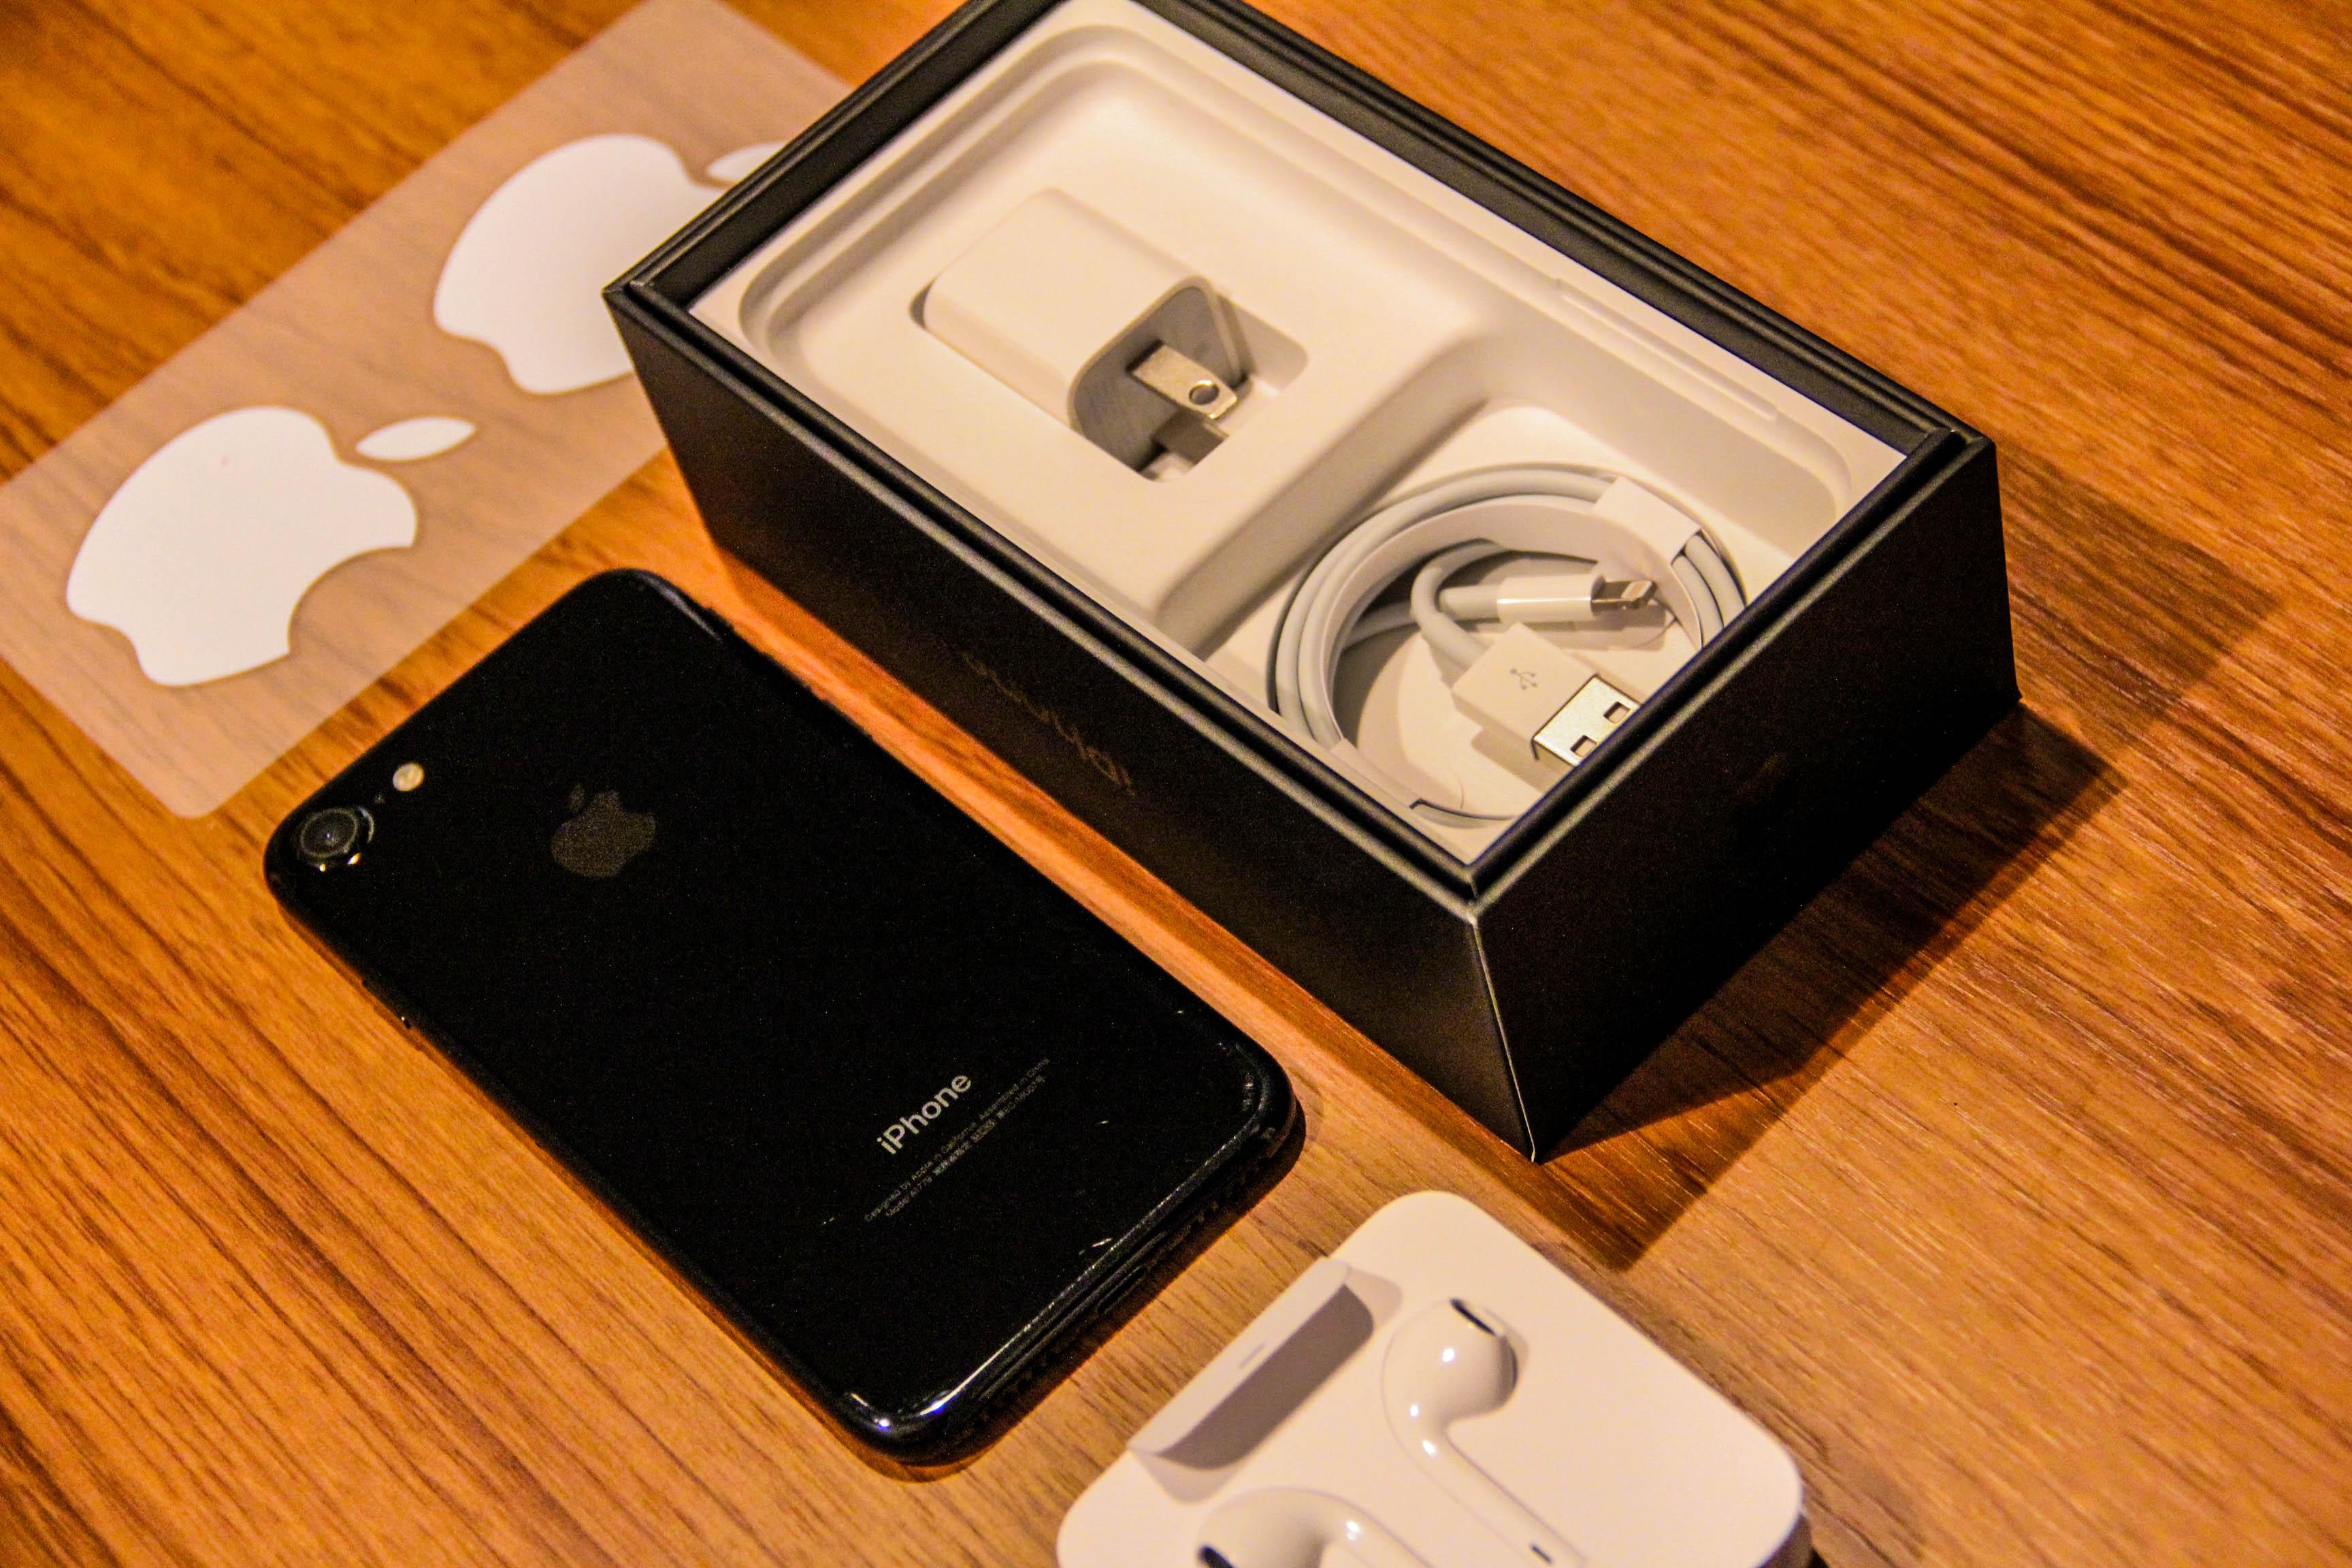 iphone7%e4%bb%98%e5%b1%9e%e5%93%81